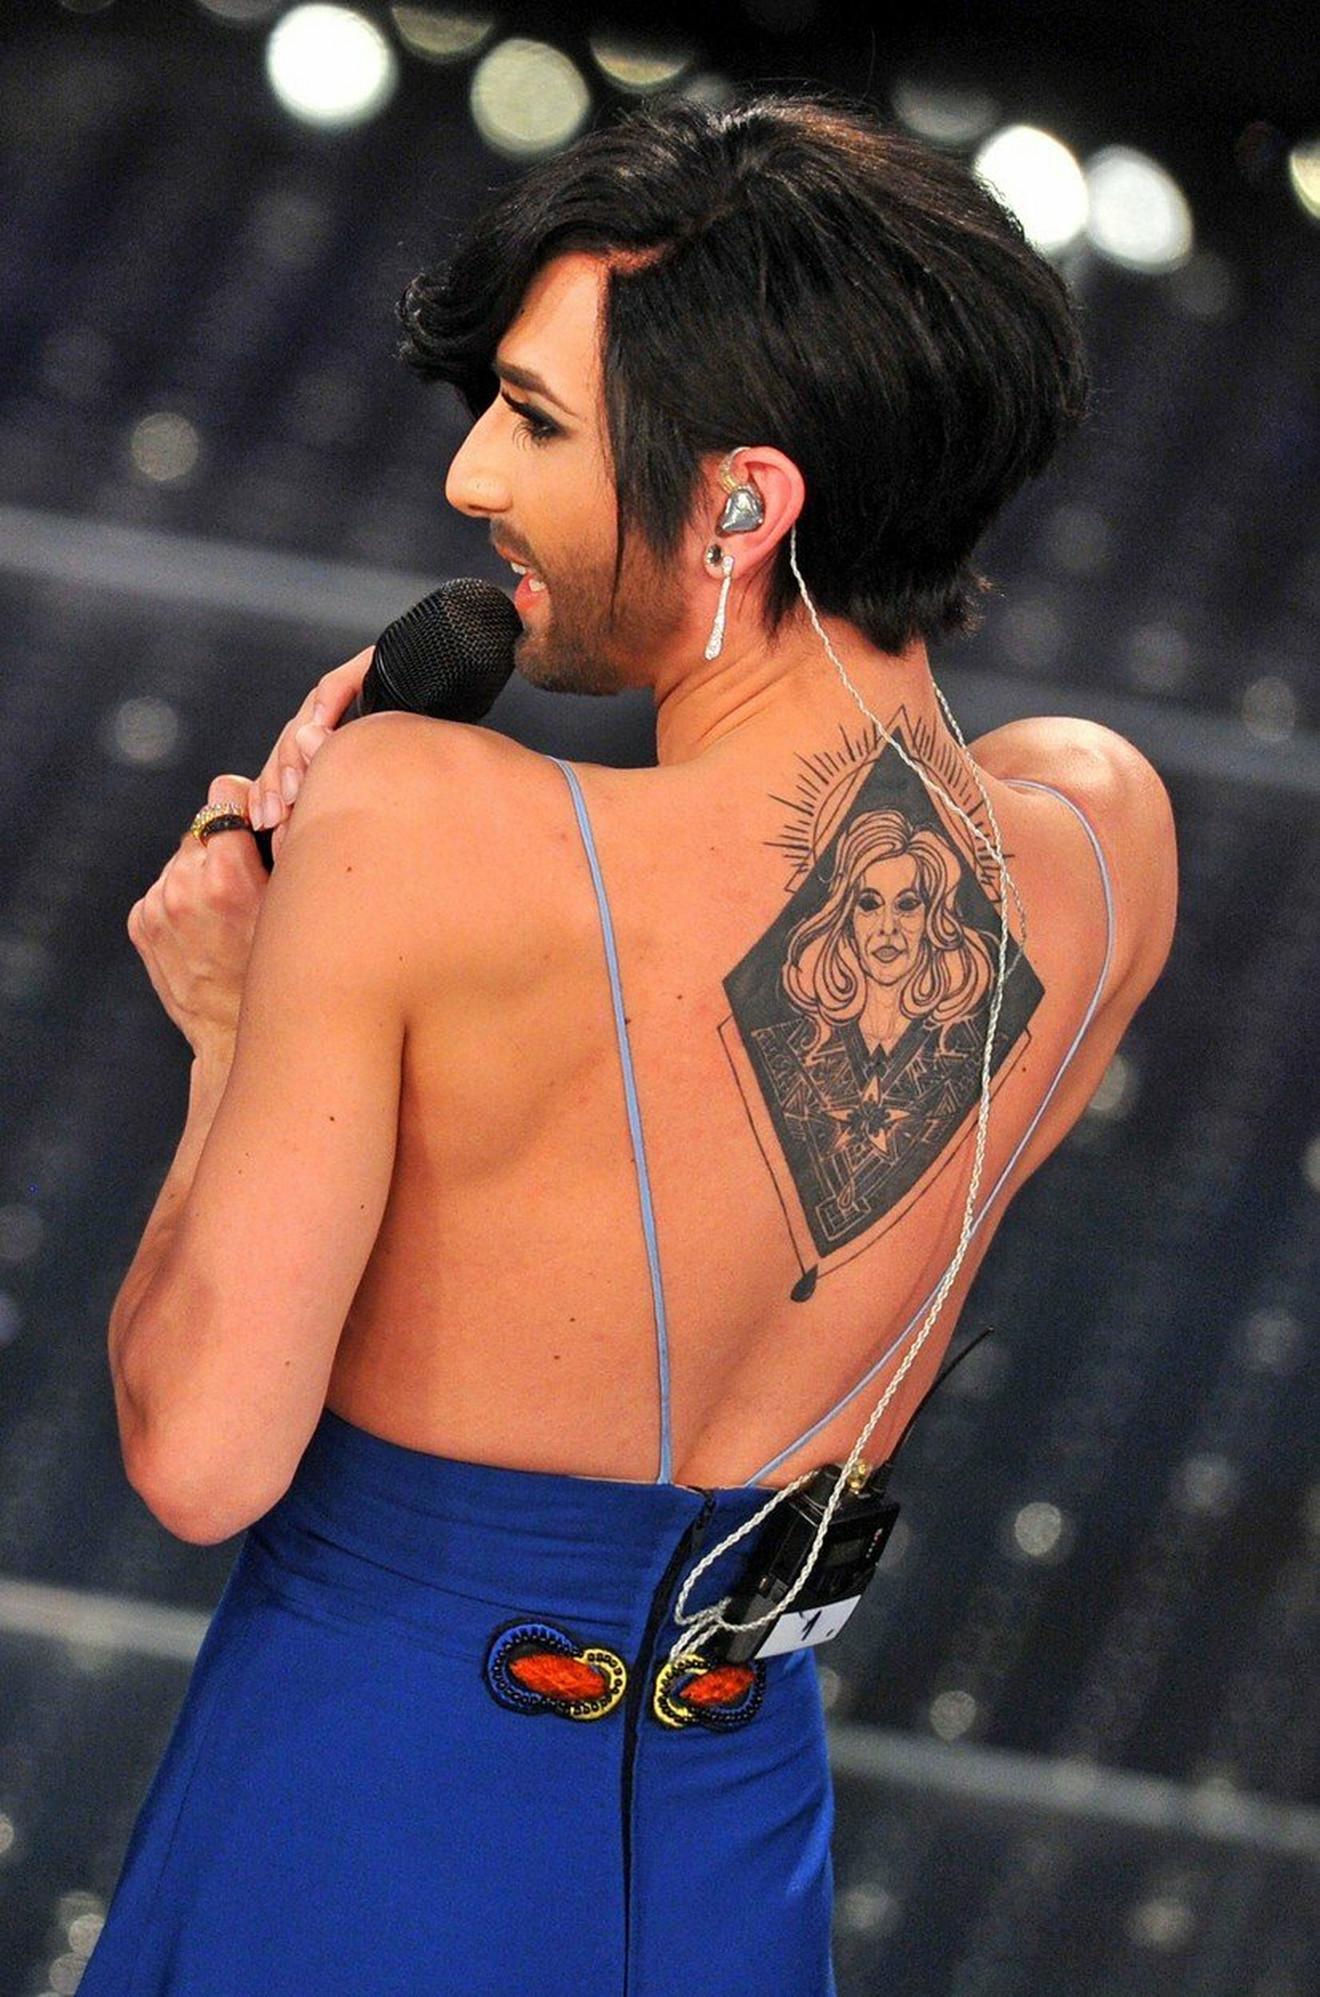 Tetovaže kao deo imidža